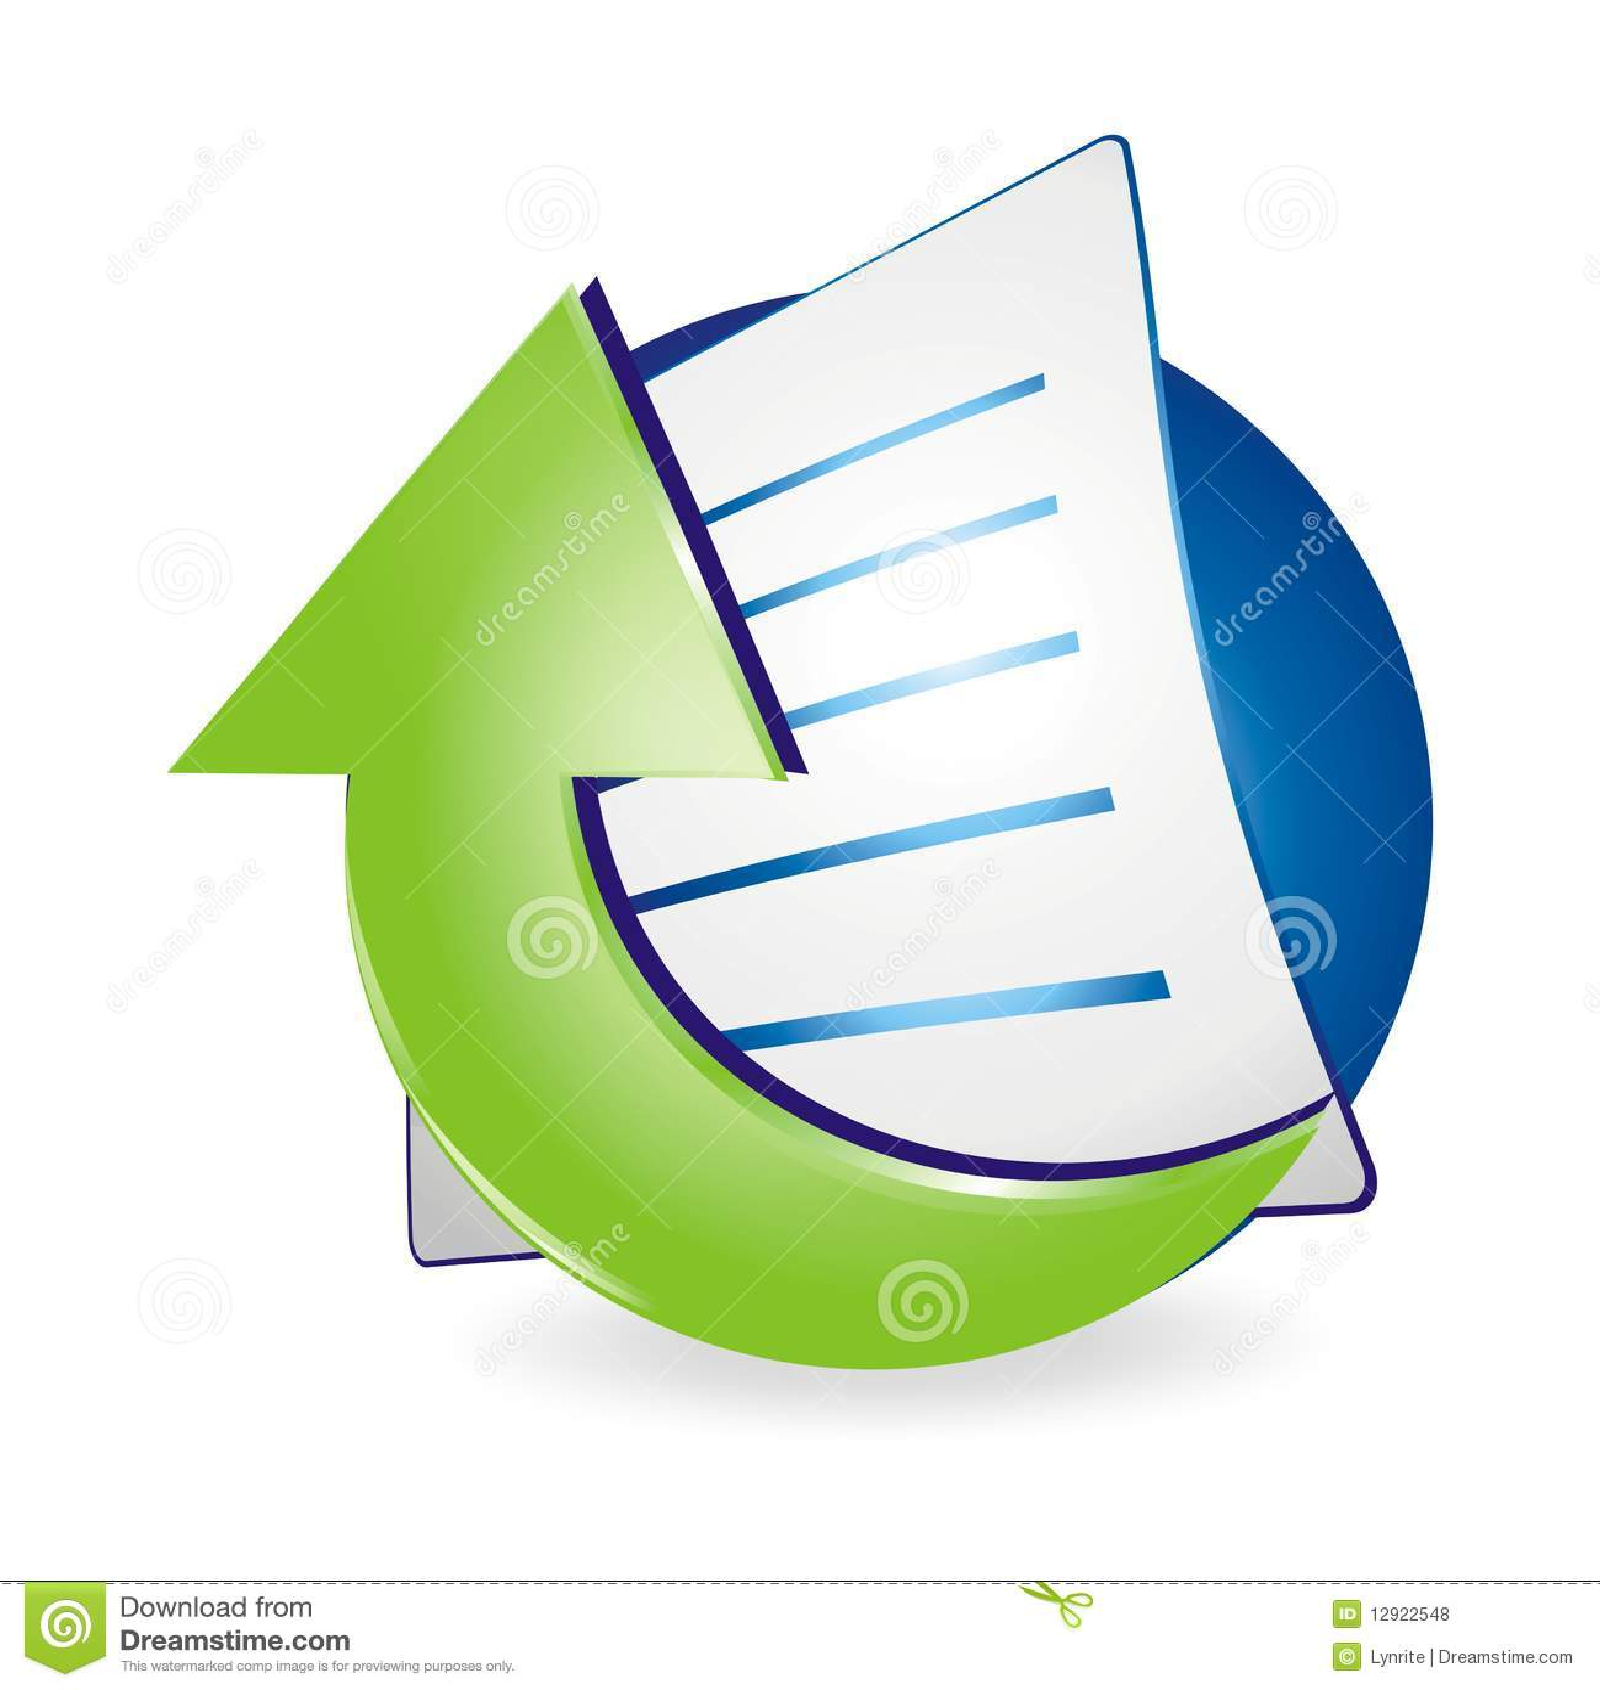 free clipart document icon - photo #45